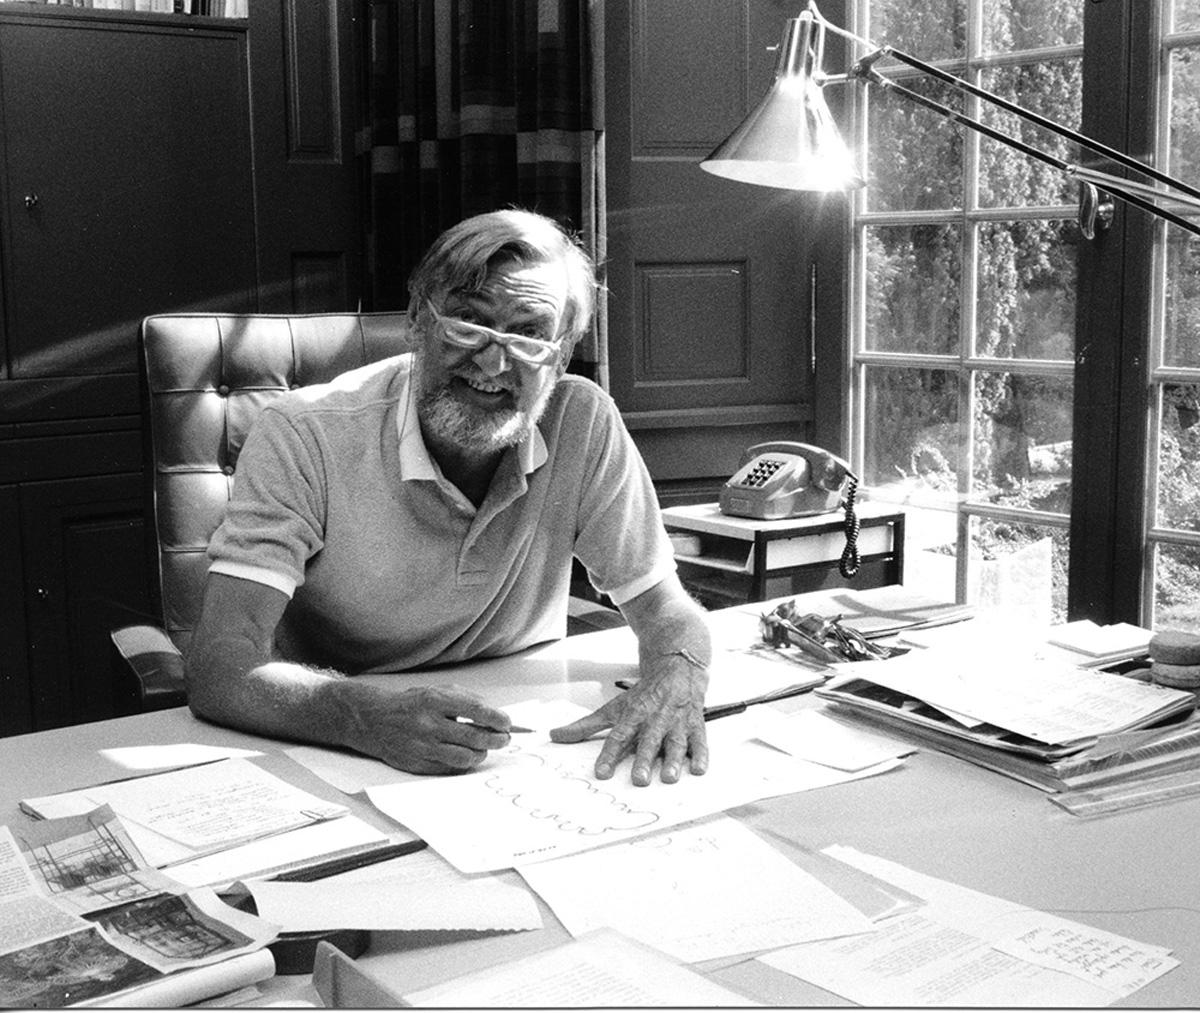 Arne-Jacobsen Designer DesignOrt Blog